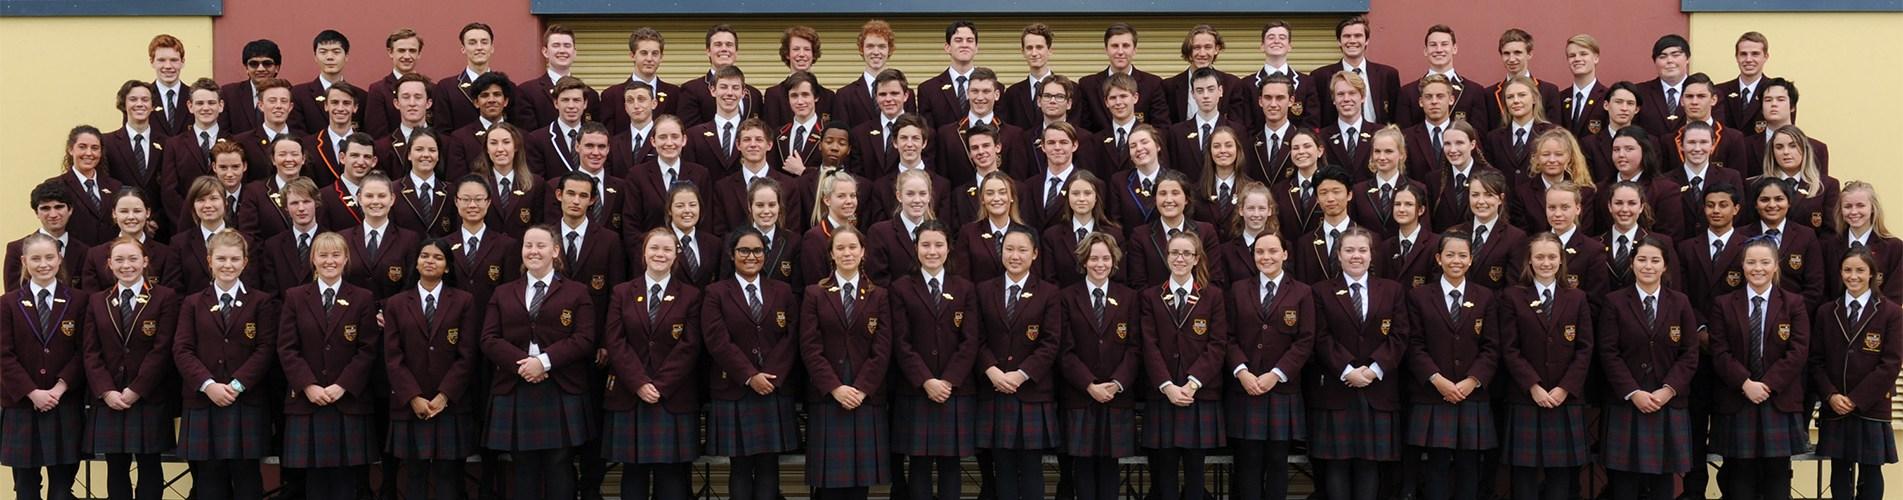 Congratulations VCE Class of 2016